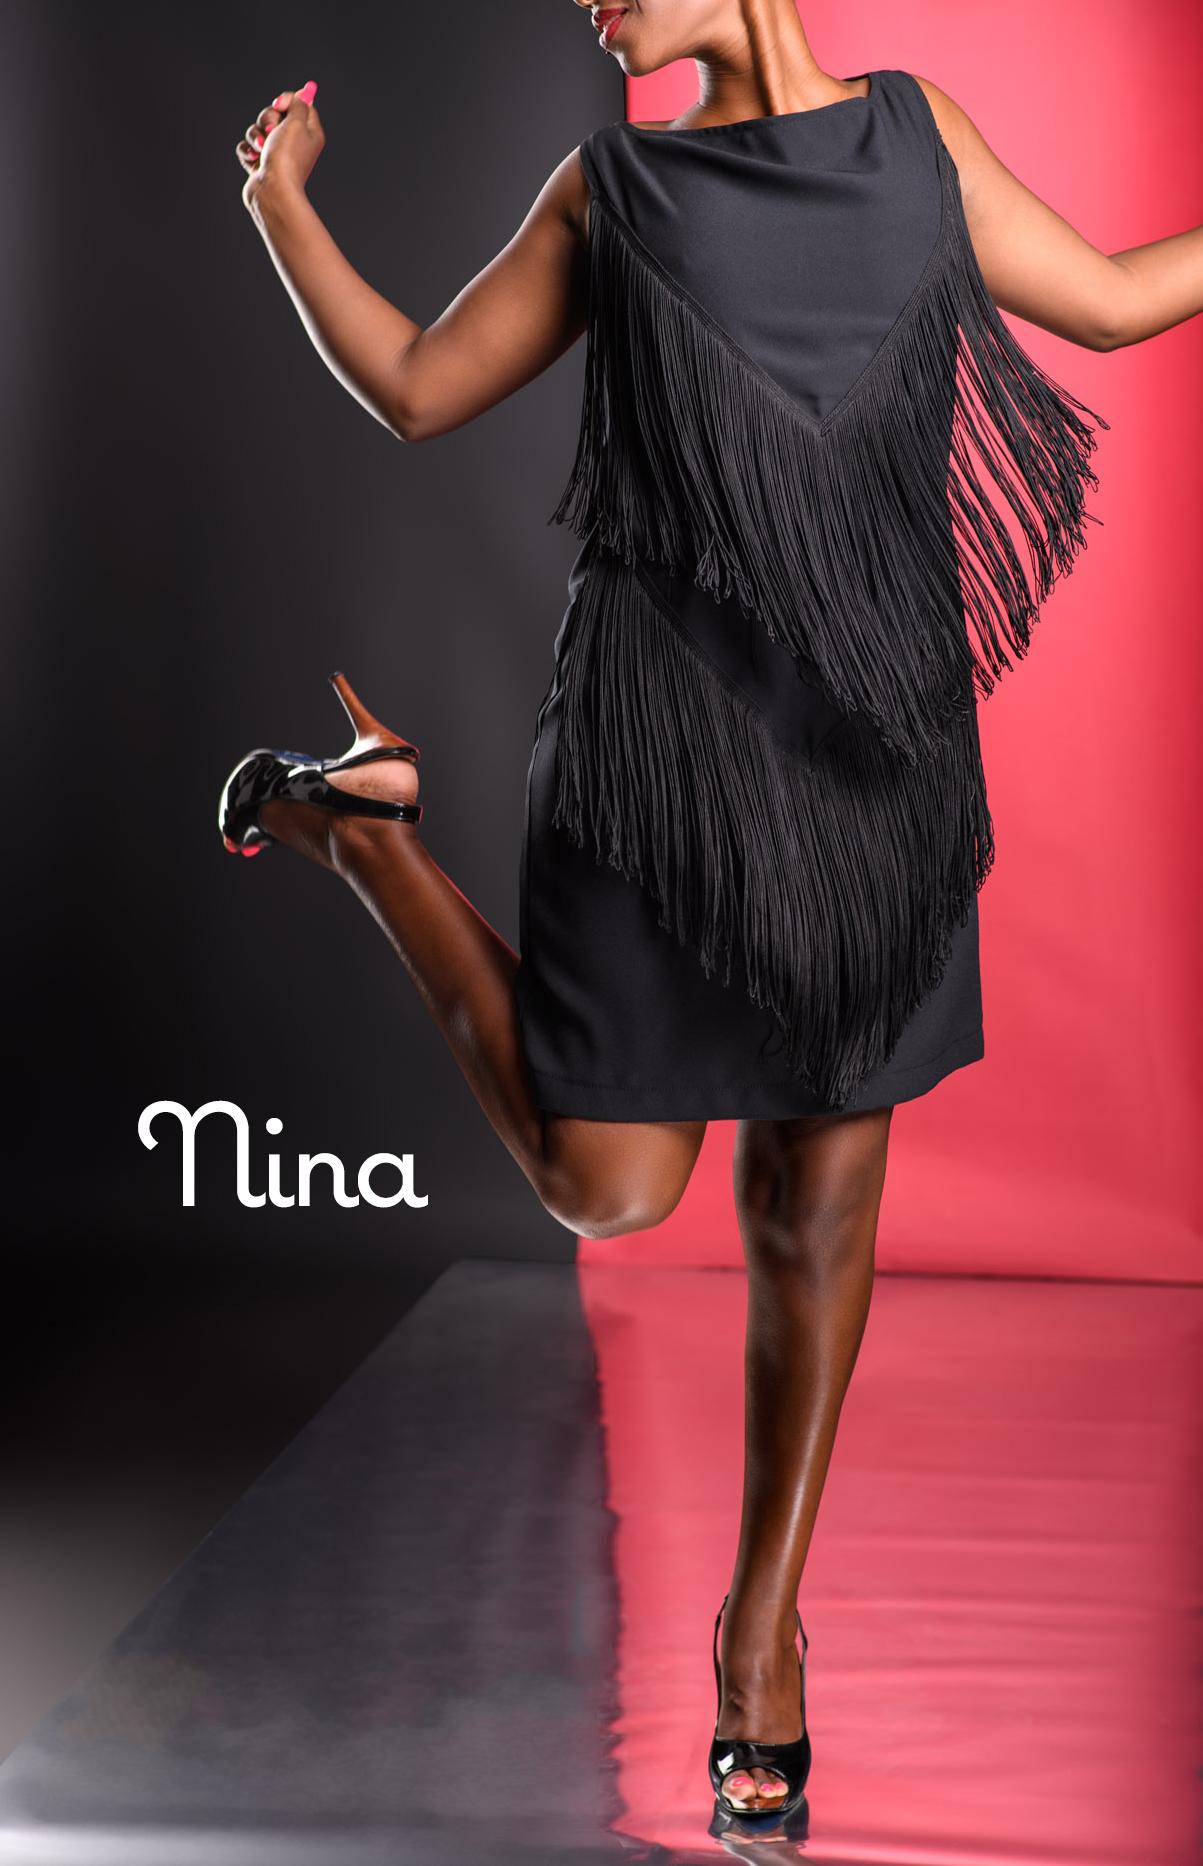 6b_Nina1_A-H2020-2